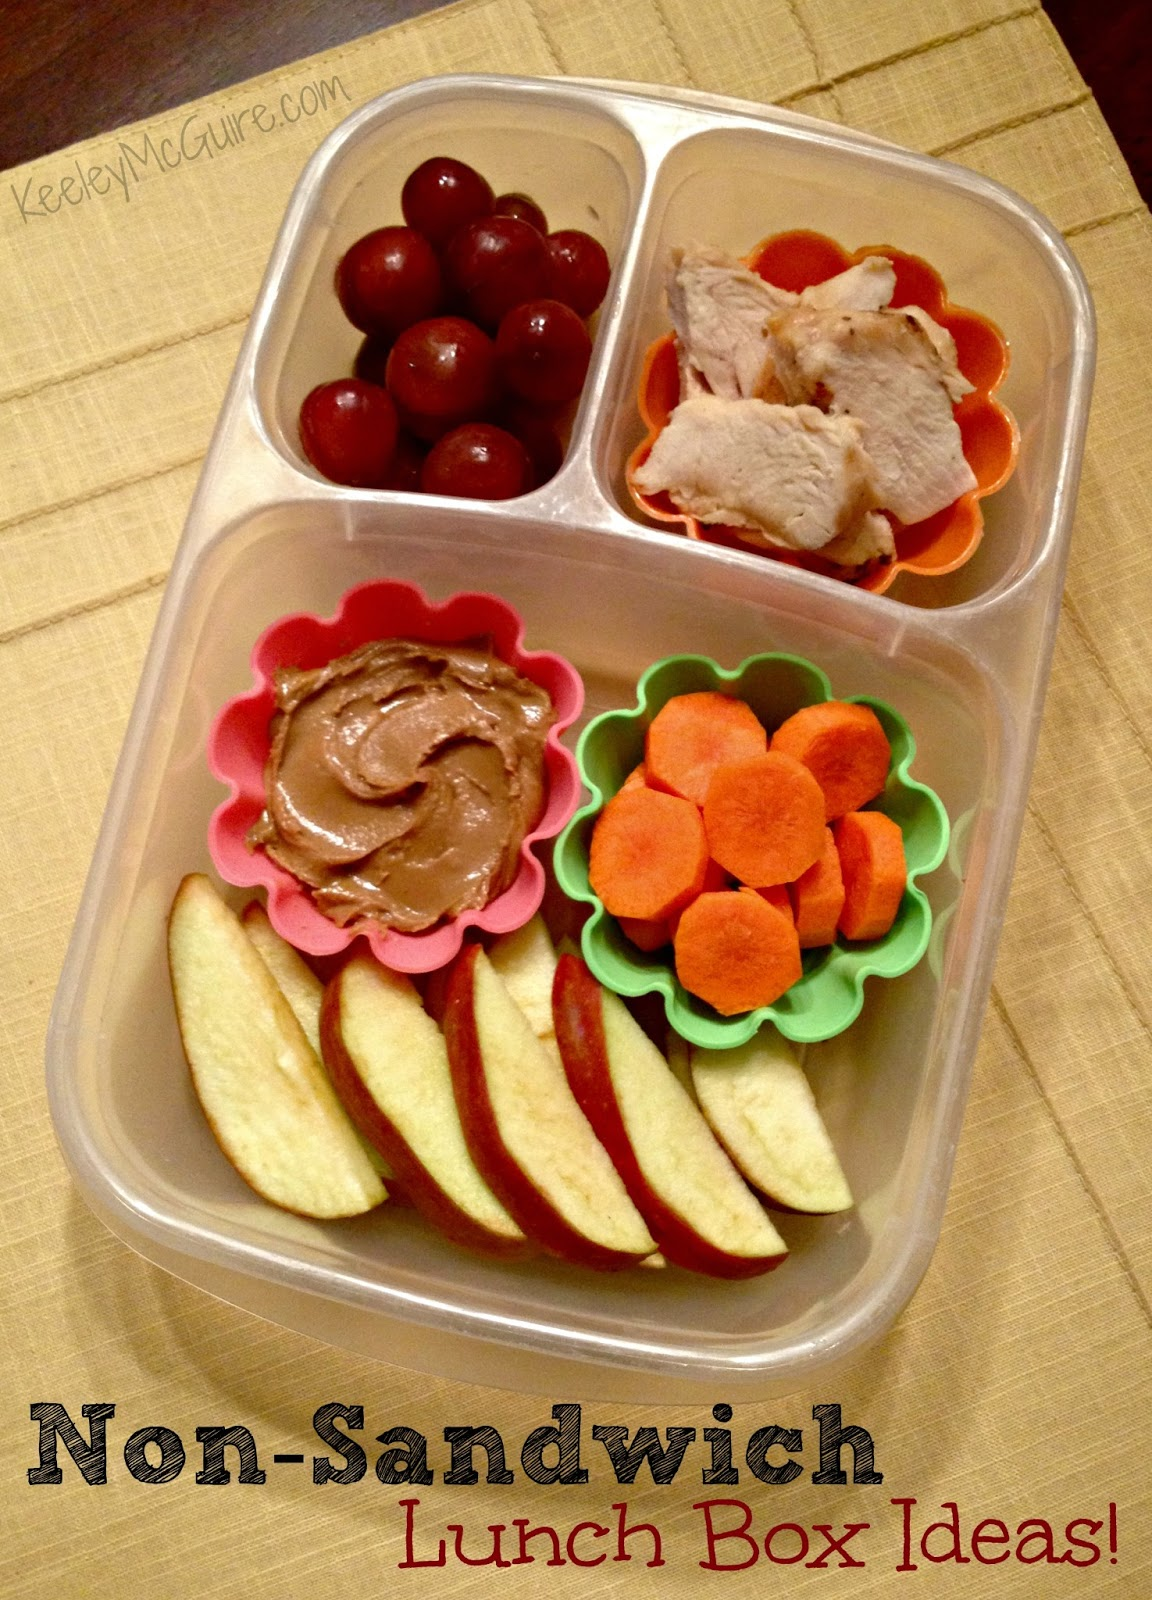 Gluten Free Allergy Friendly Lunch Made Easy 20 Non Sandwich School Ideas For Kids